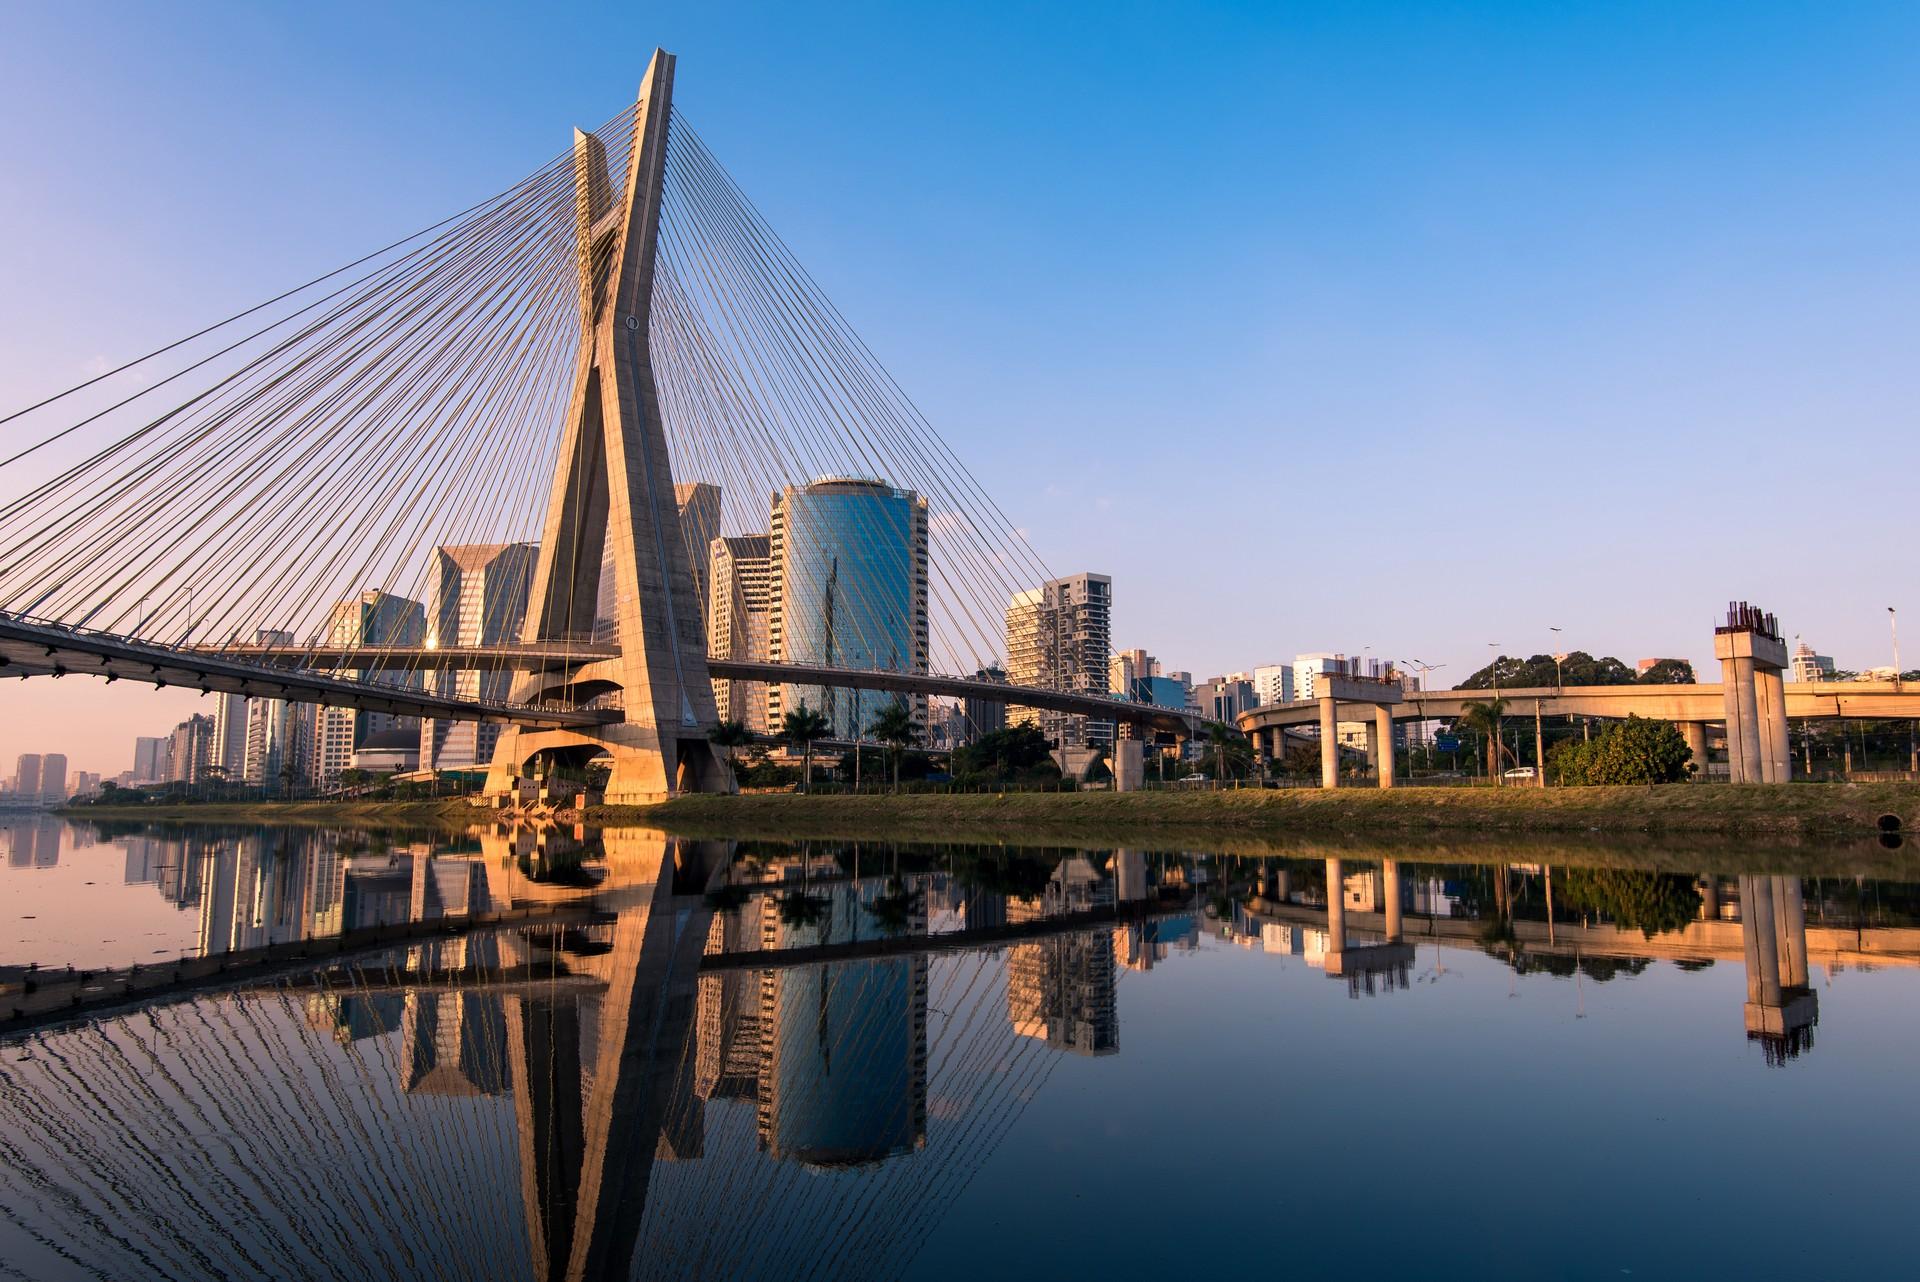 The cityscape of São Paulo